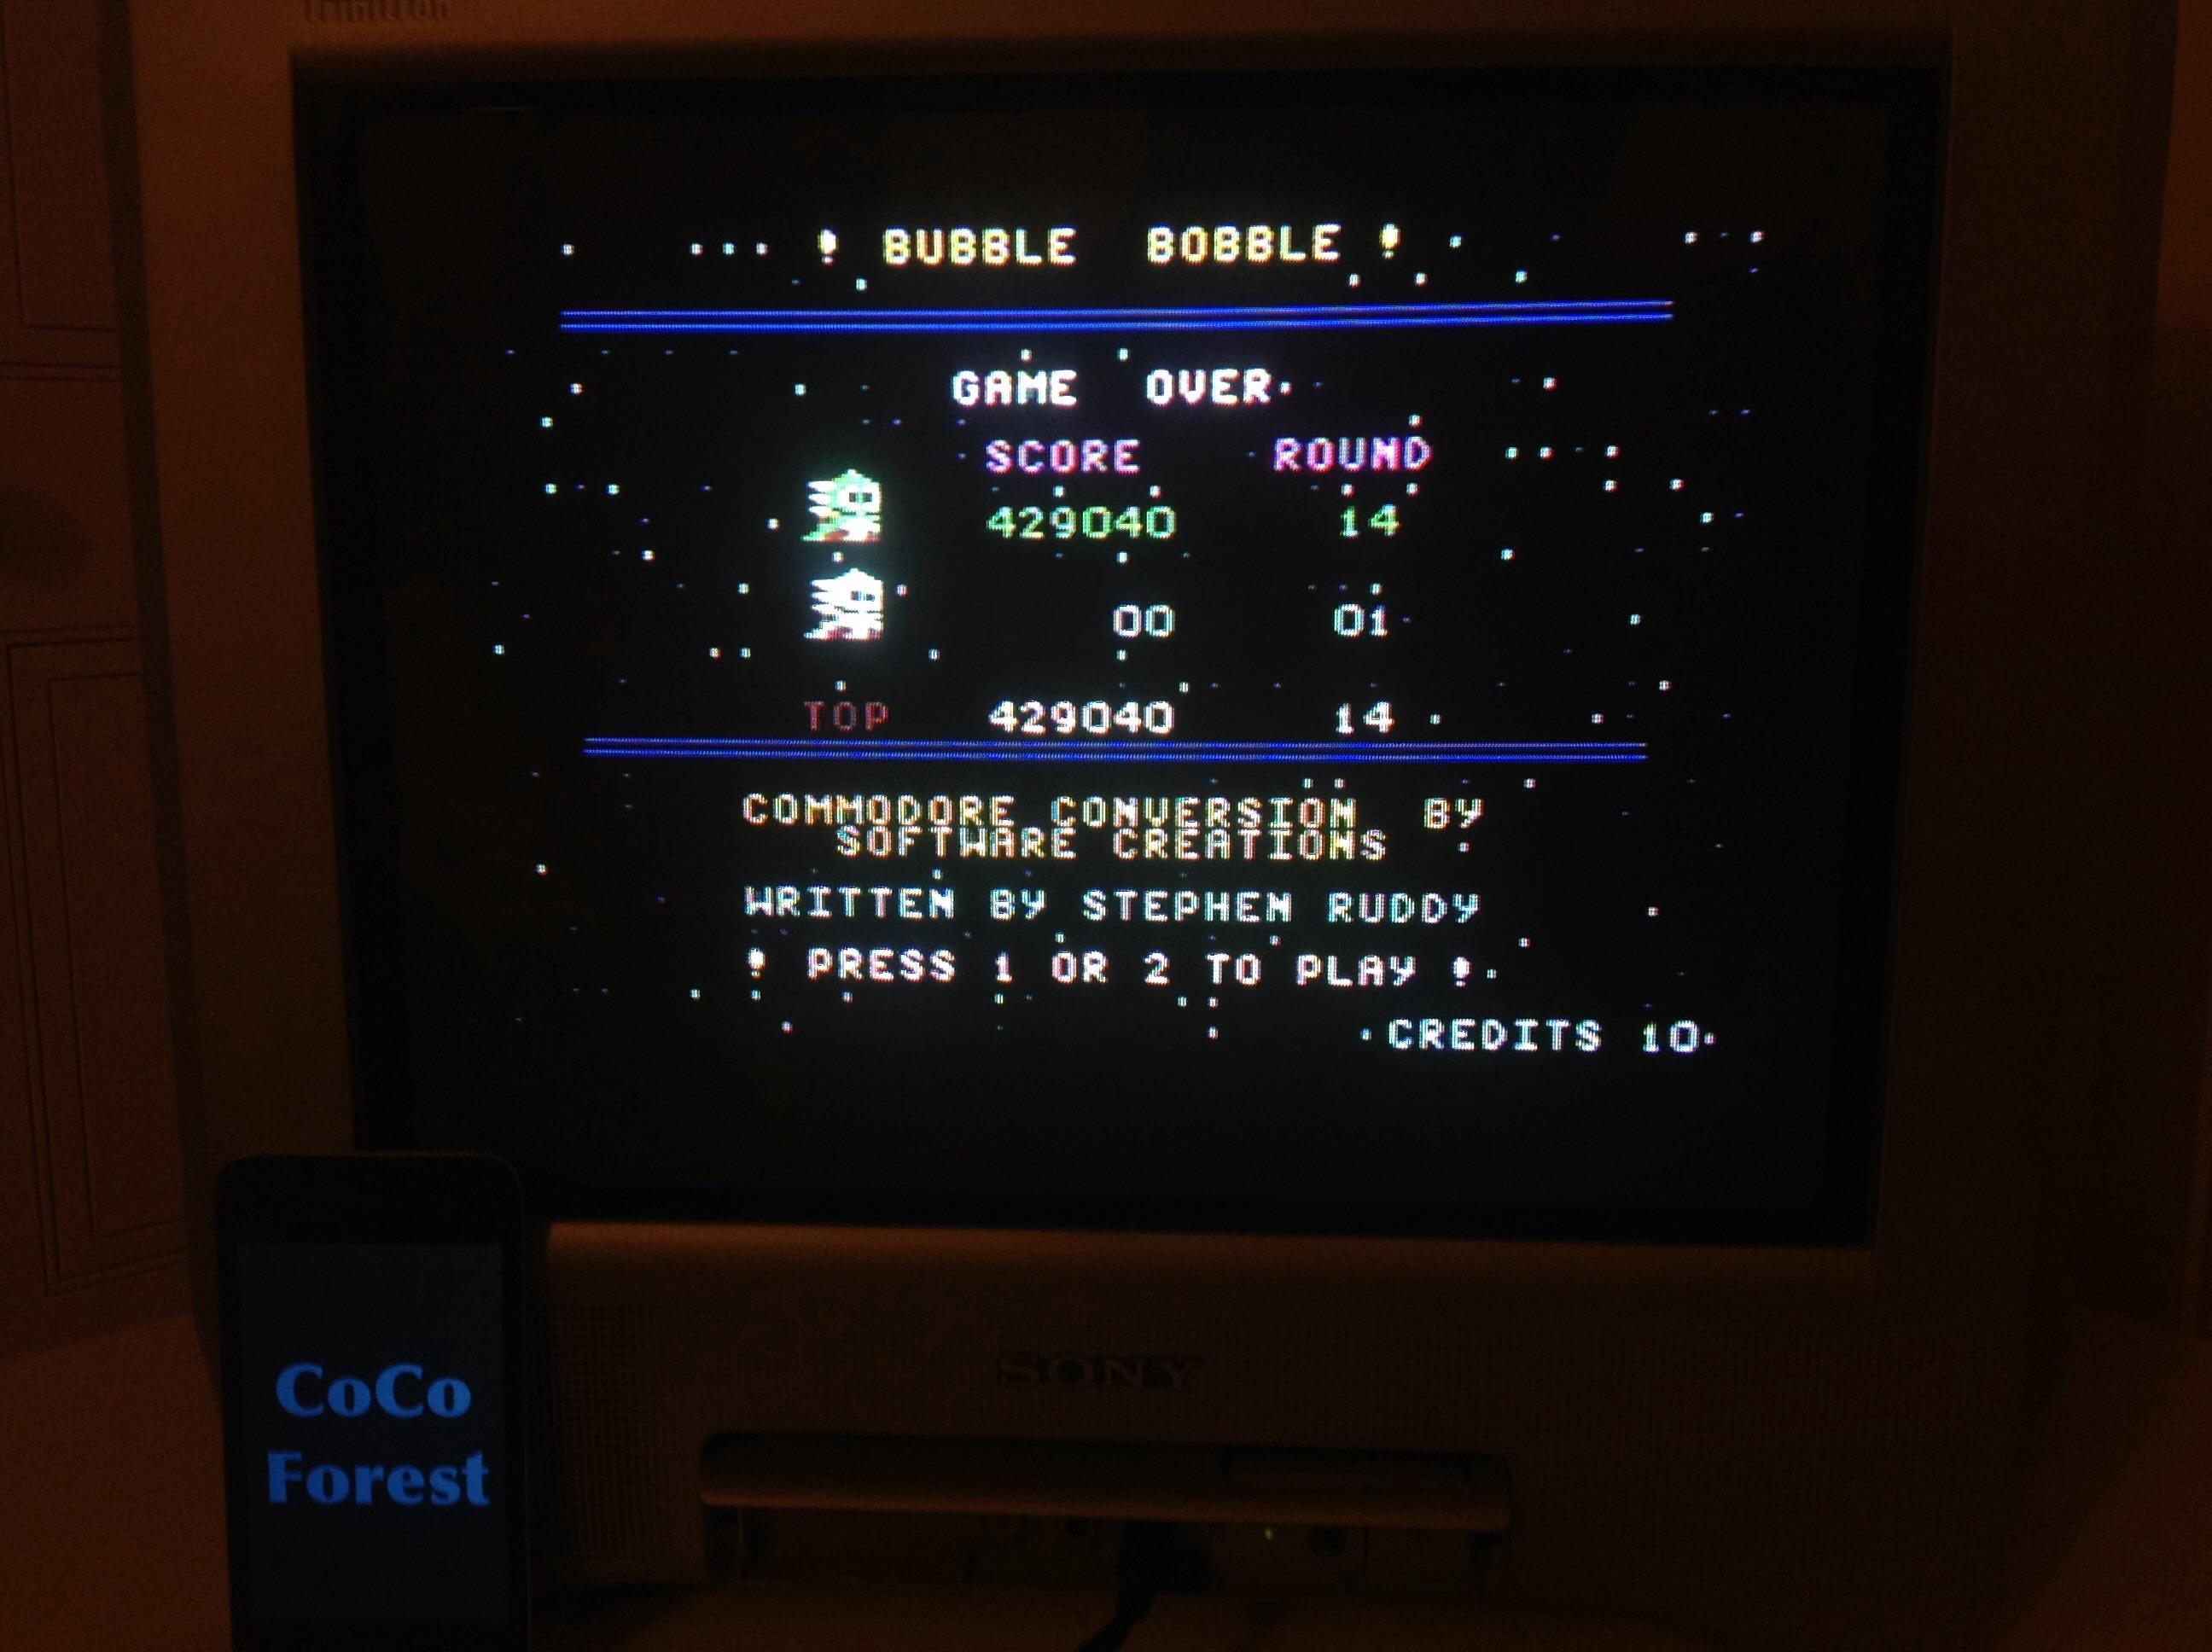 CoCoForest: Bubble Bobble (Commodore 64) 429,040 points on 2015-03-16 14:12:19